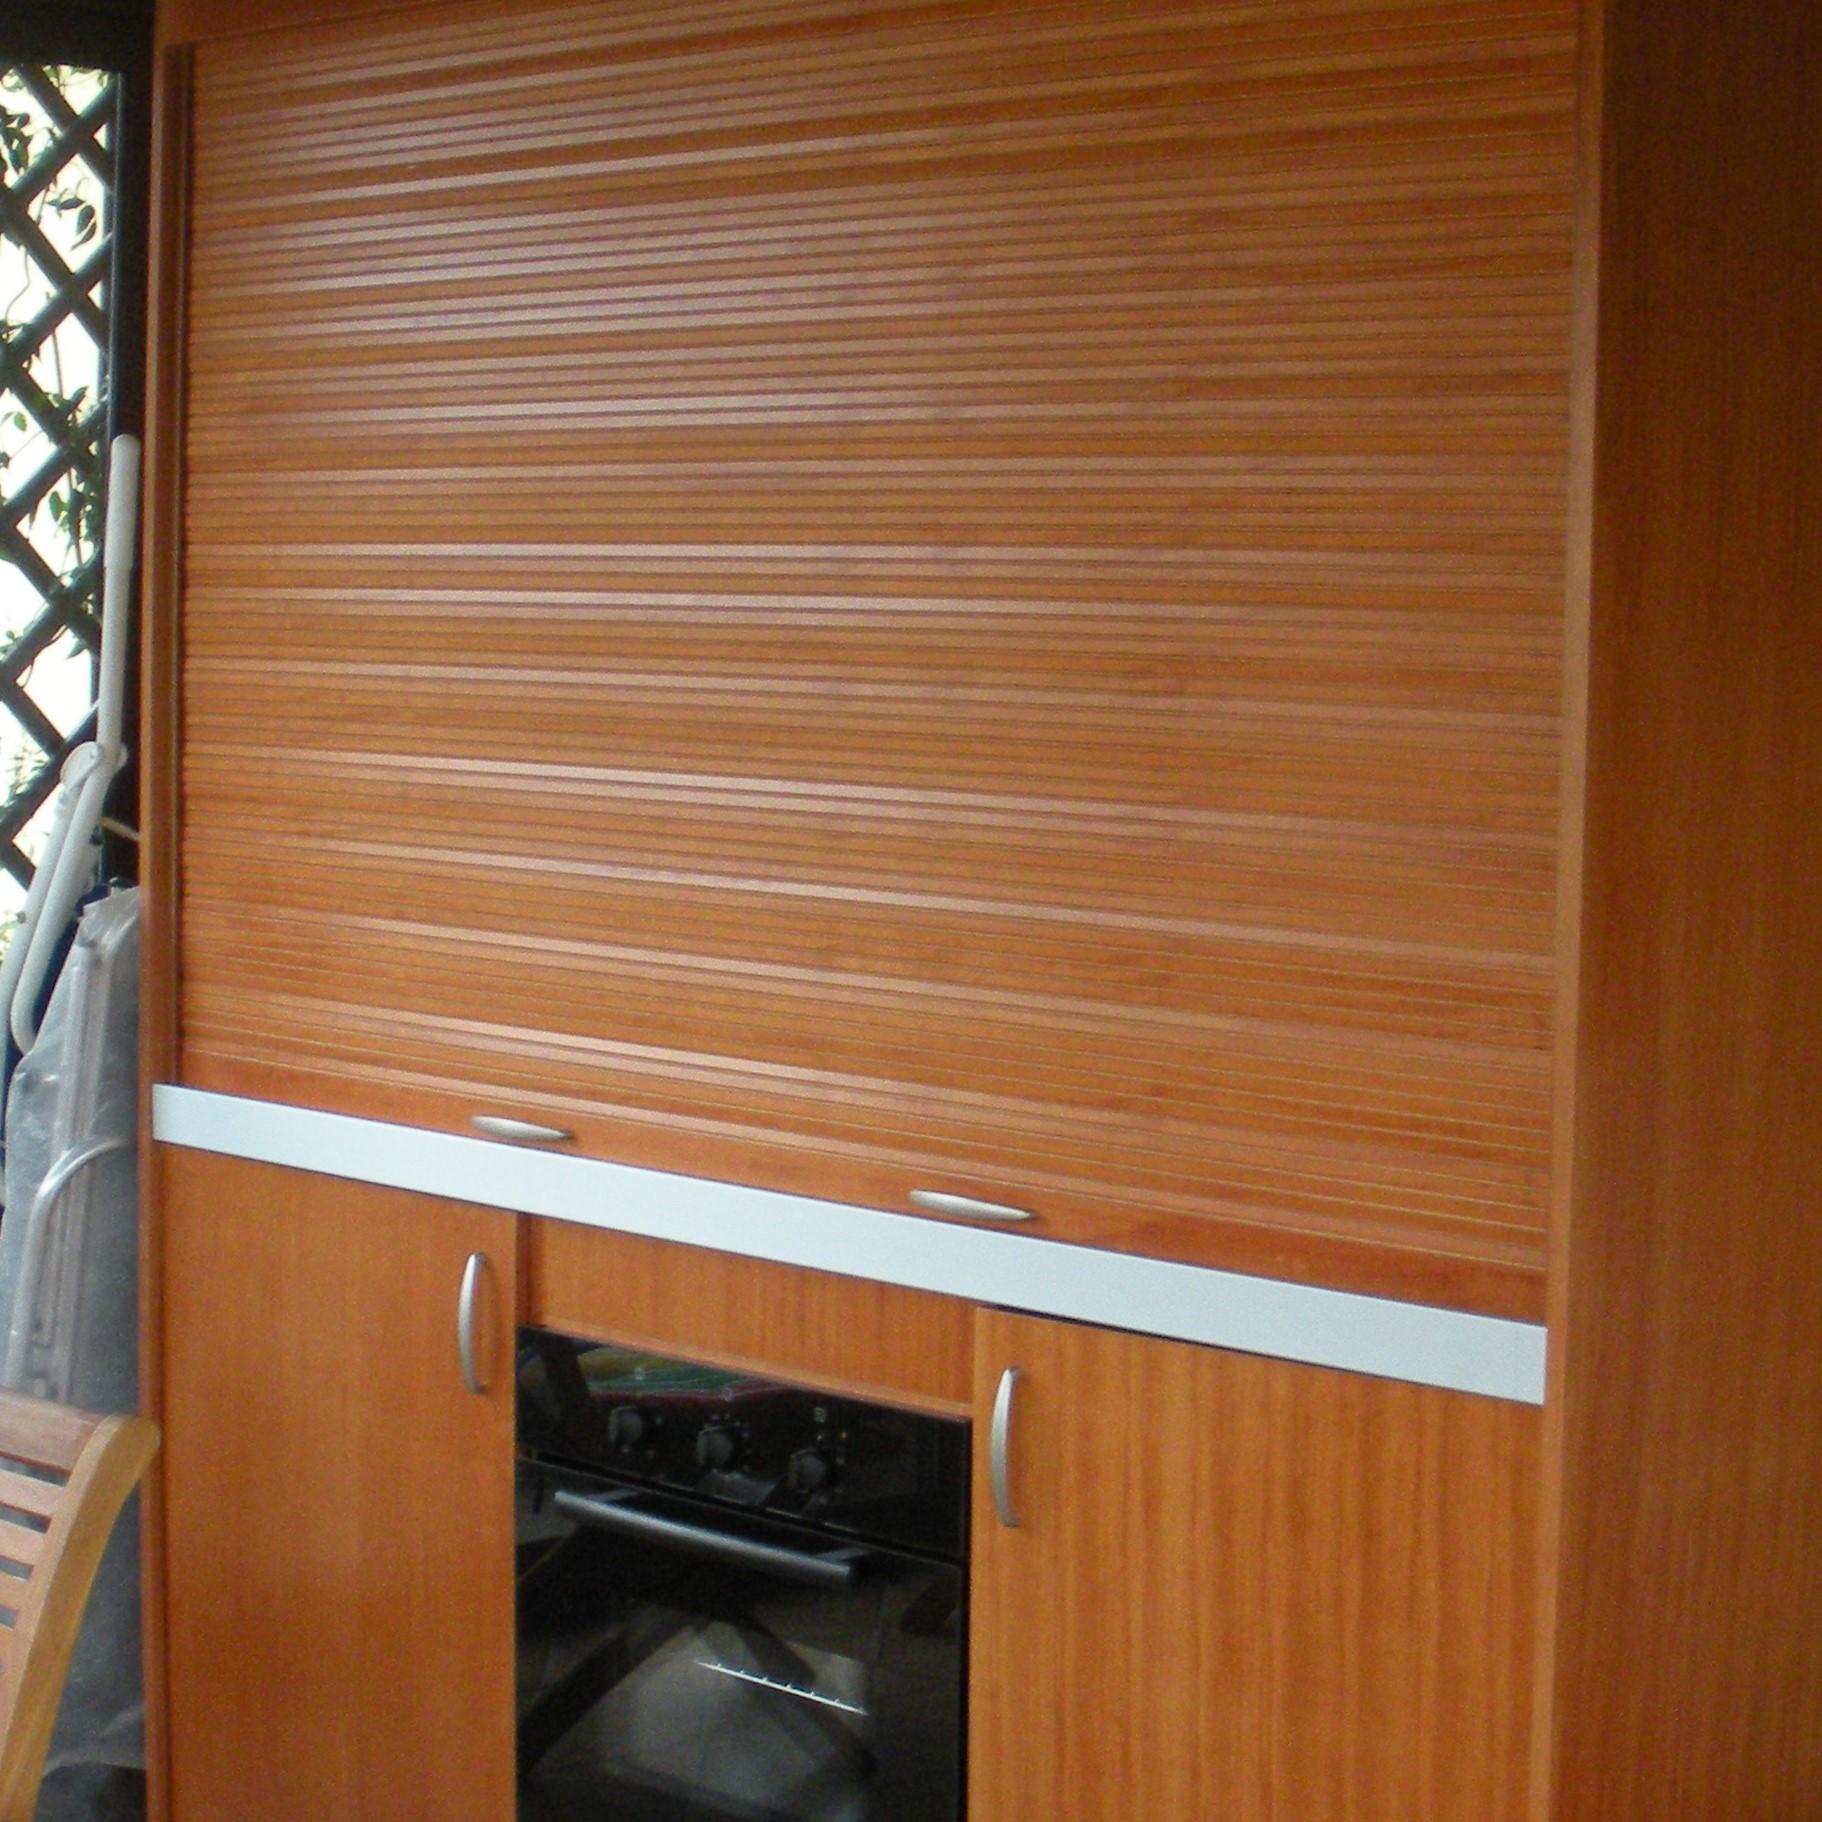 Armadio cucina compact 184 vivilospazio mobili - Cucine armadio a scomparsa ...